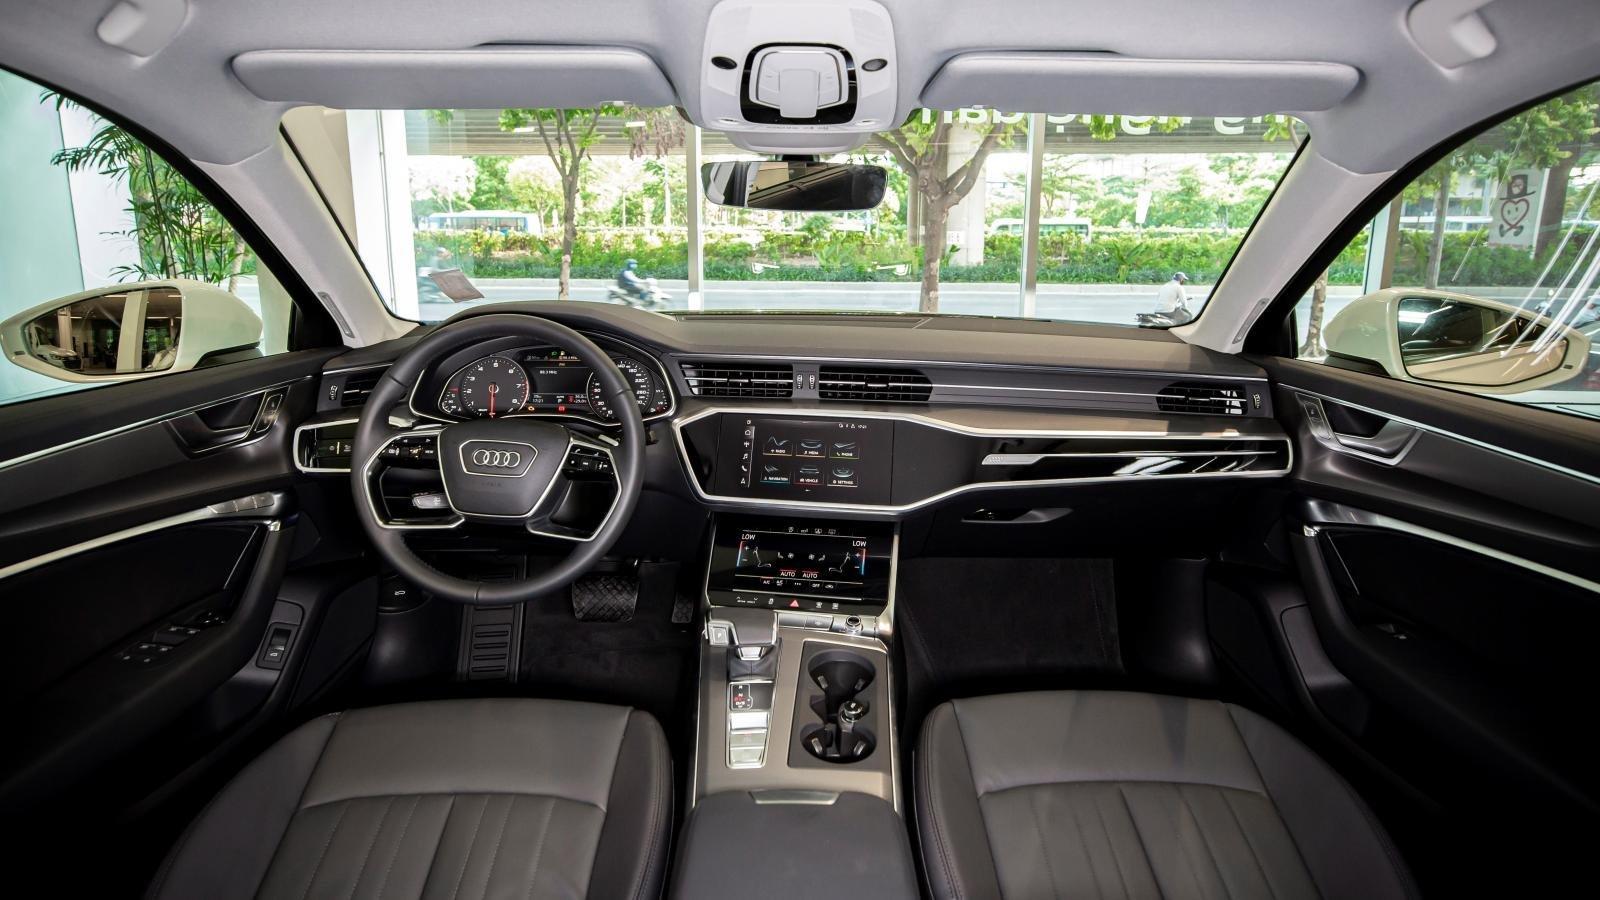 Nội thất xe Audi A6.